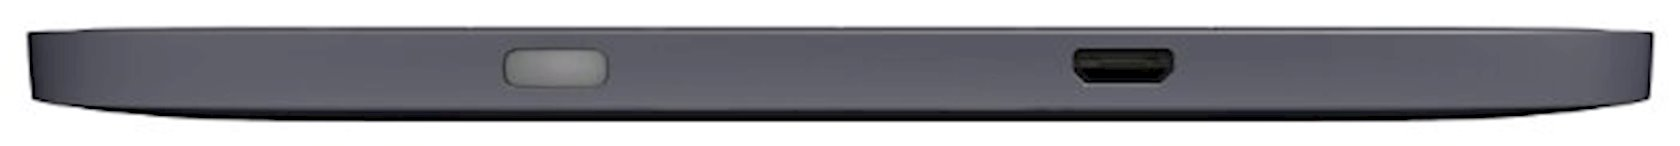 Elektron kitab  Pocketbook 740 Pro Metallic Grey